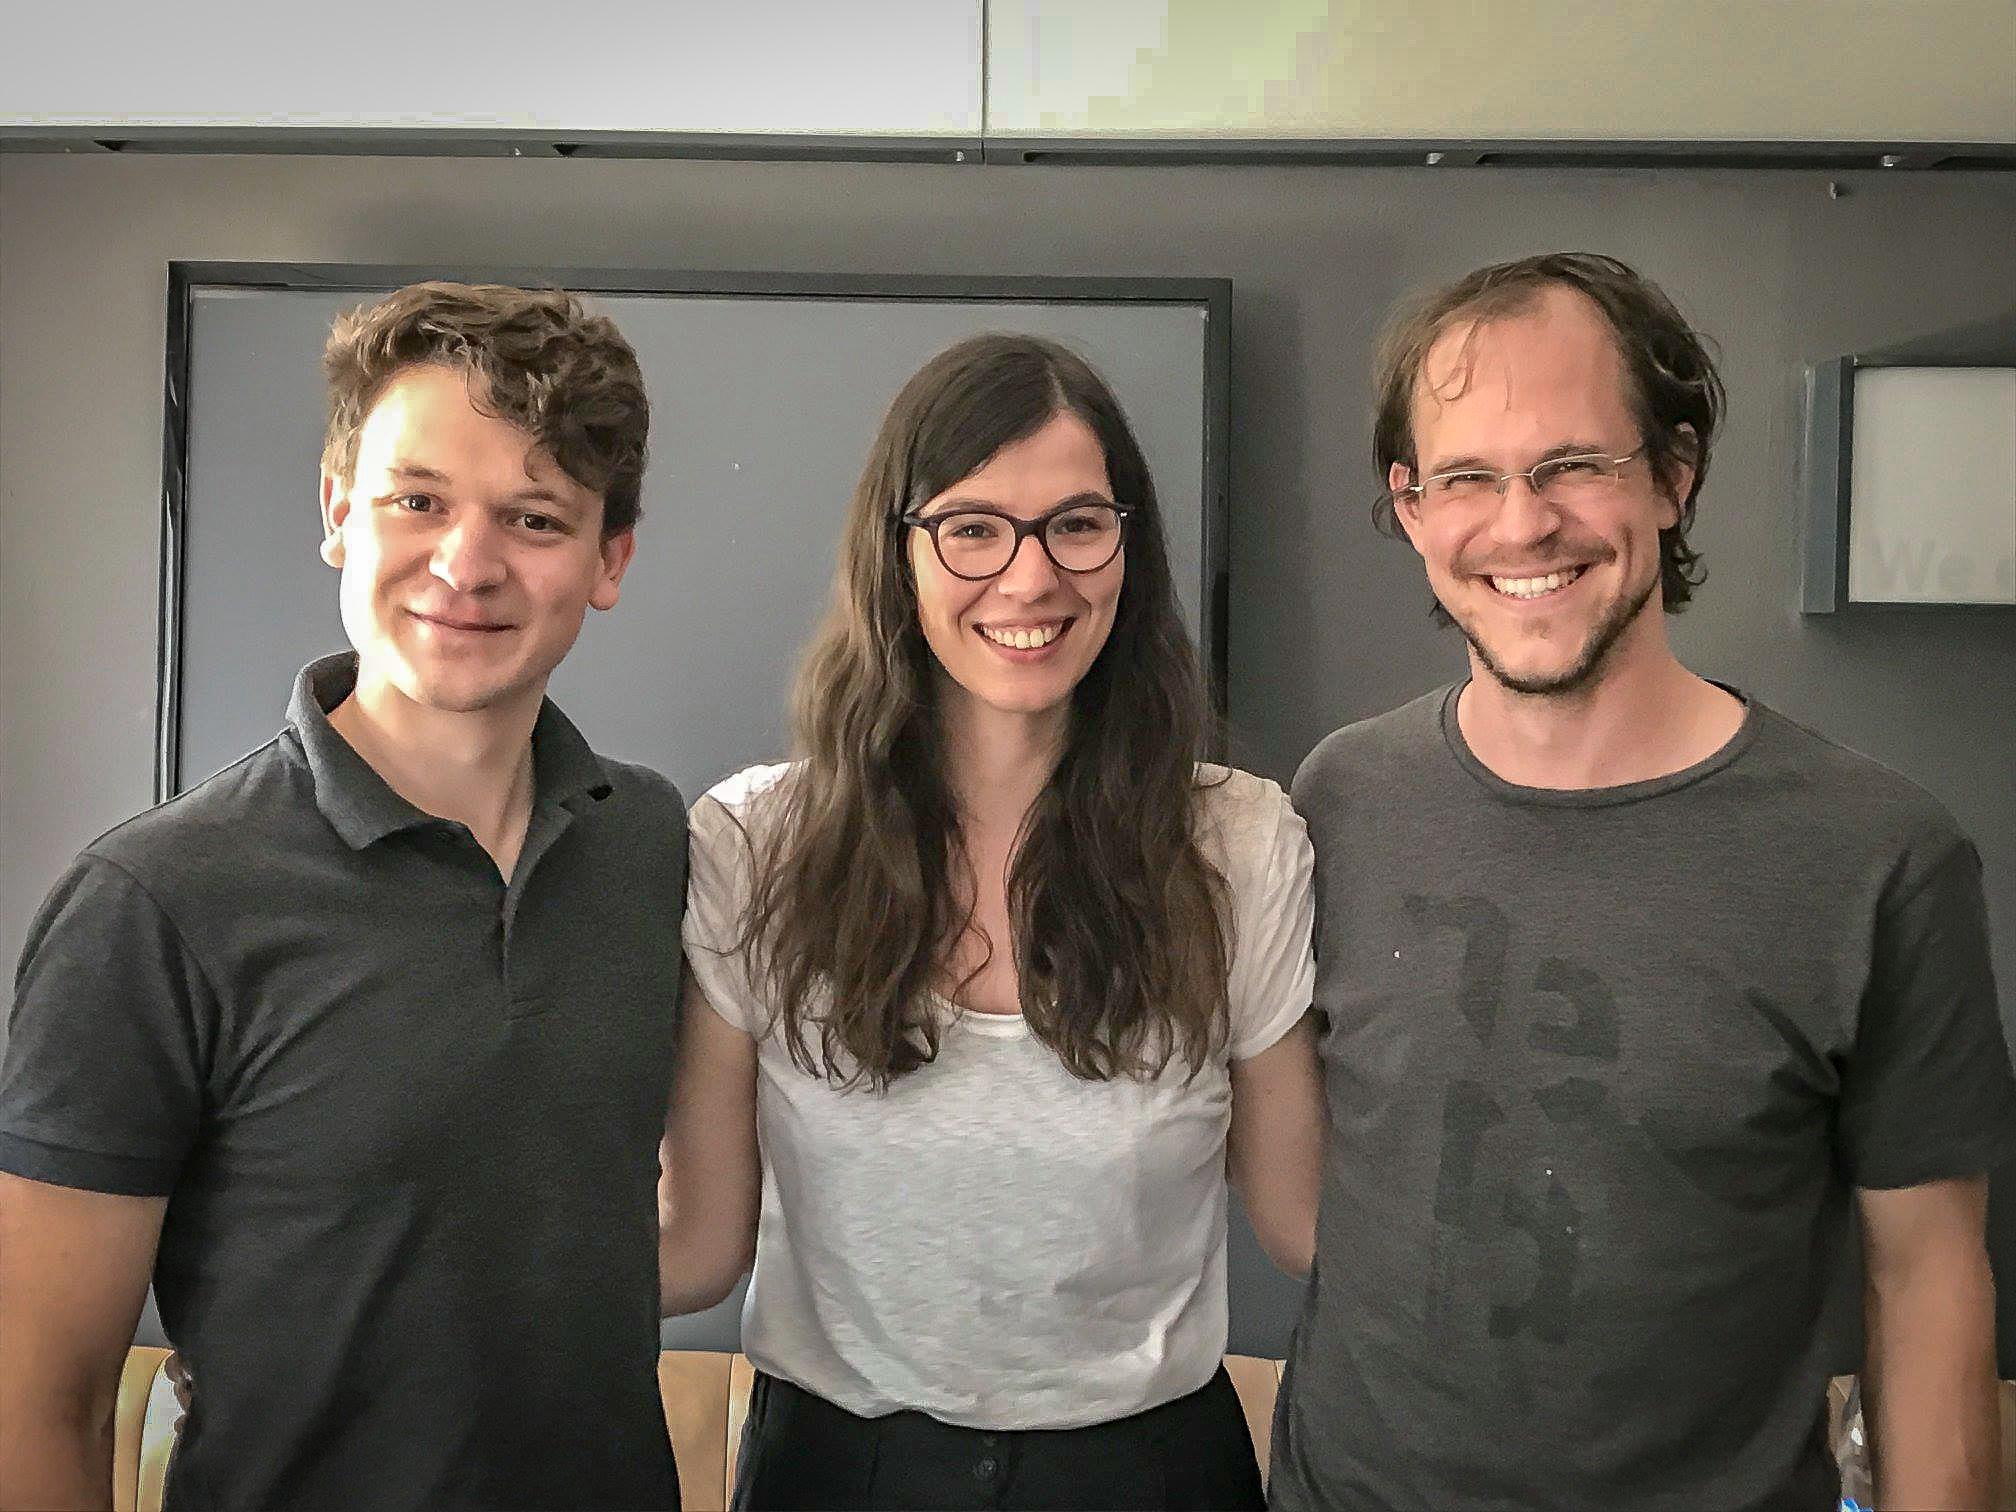 Vorstand der Kölner Jazzkonferenz e.V.: Janning Trumann, Theresia Philipp, Dr. Urs Benedikt Müller